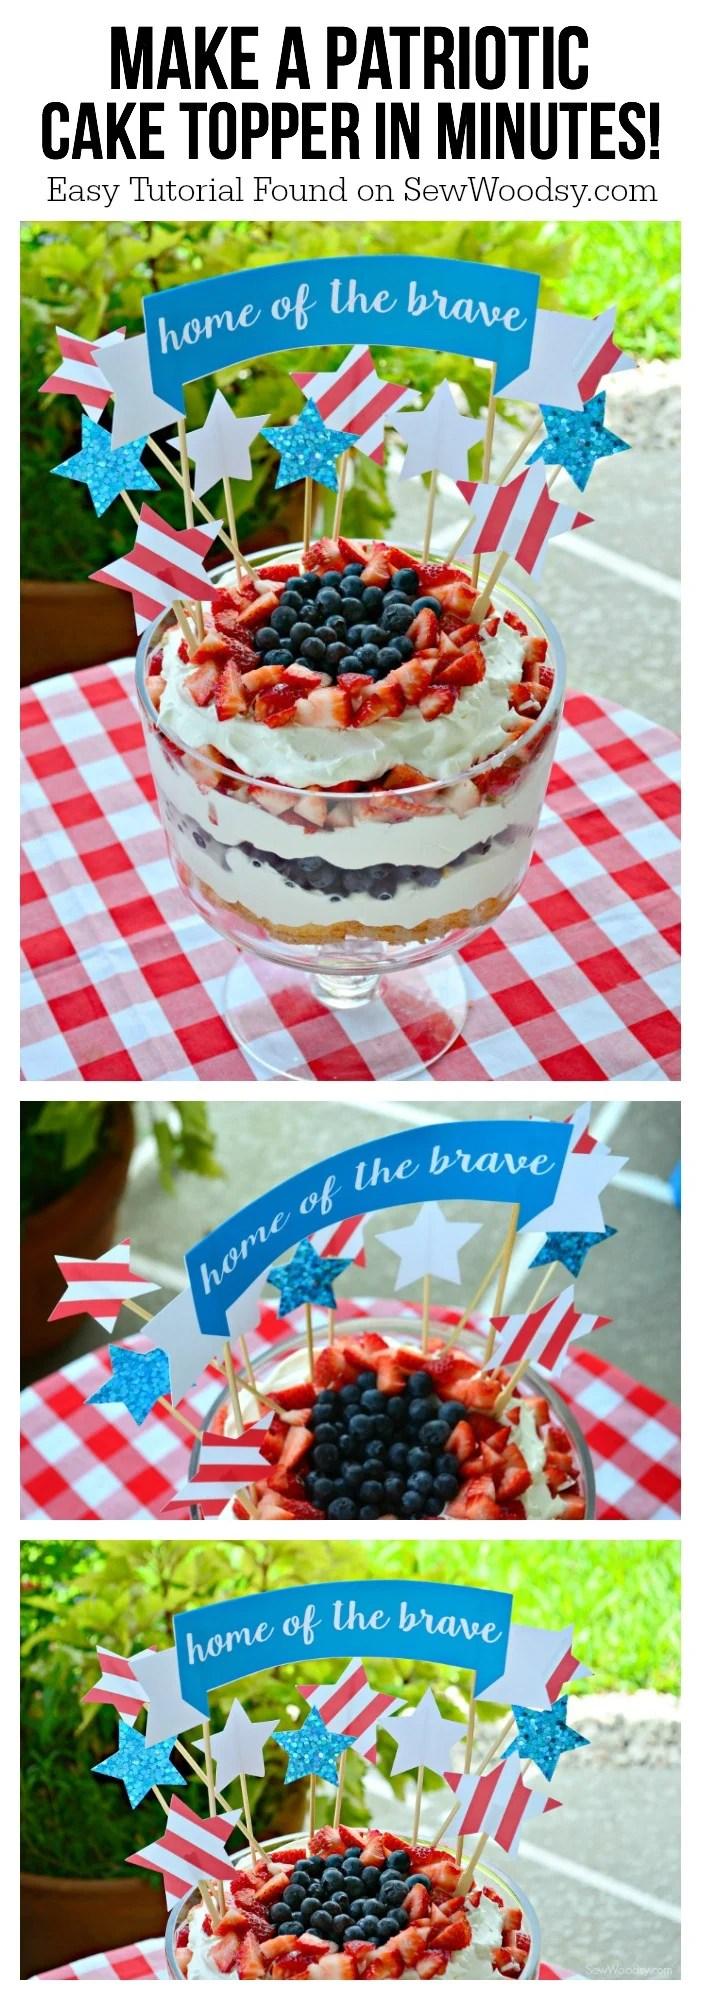 Make a patriotic cake topper in minutes!